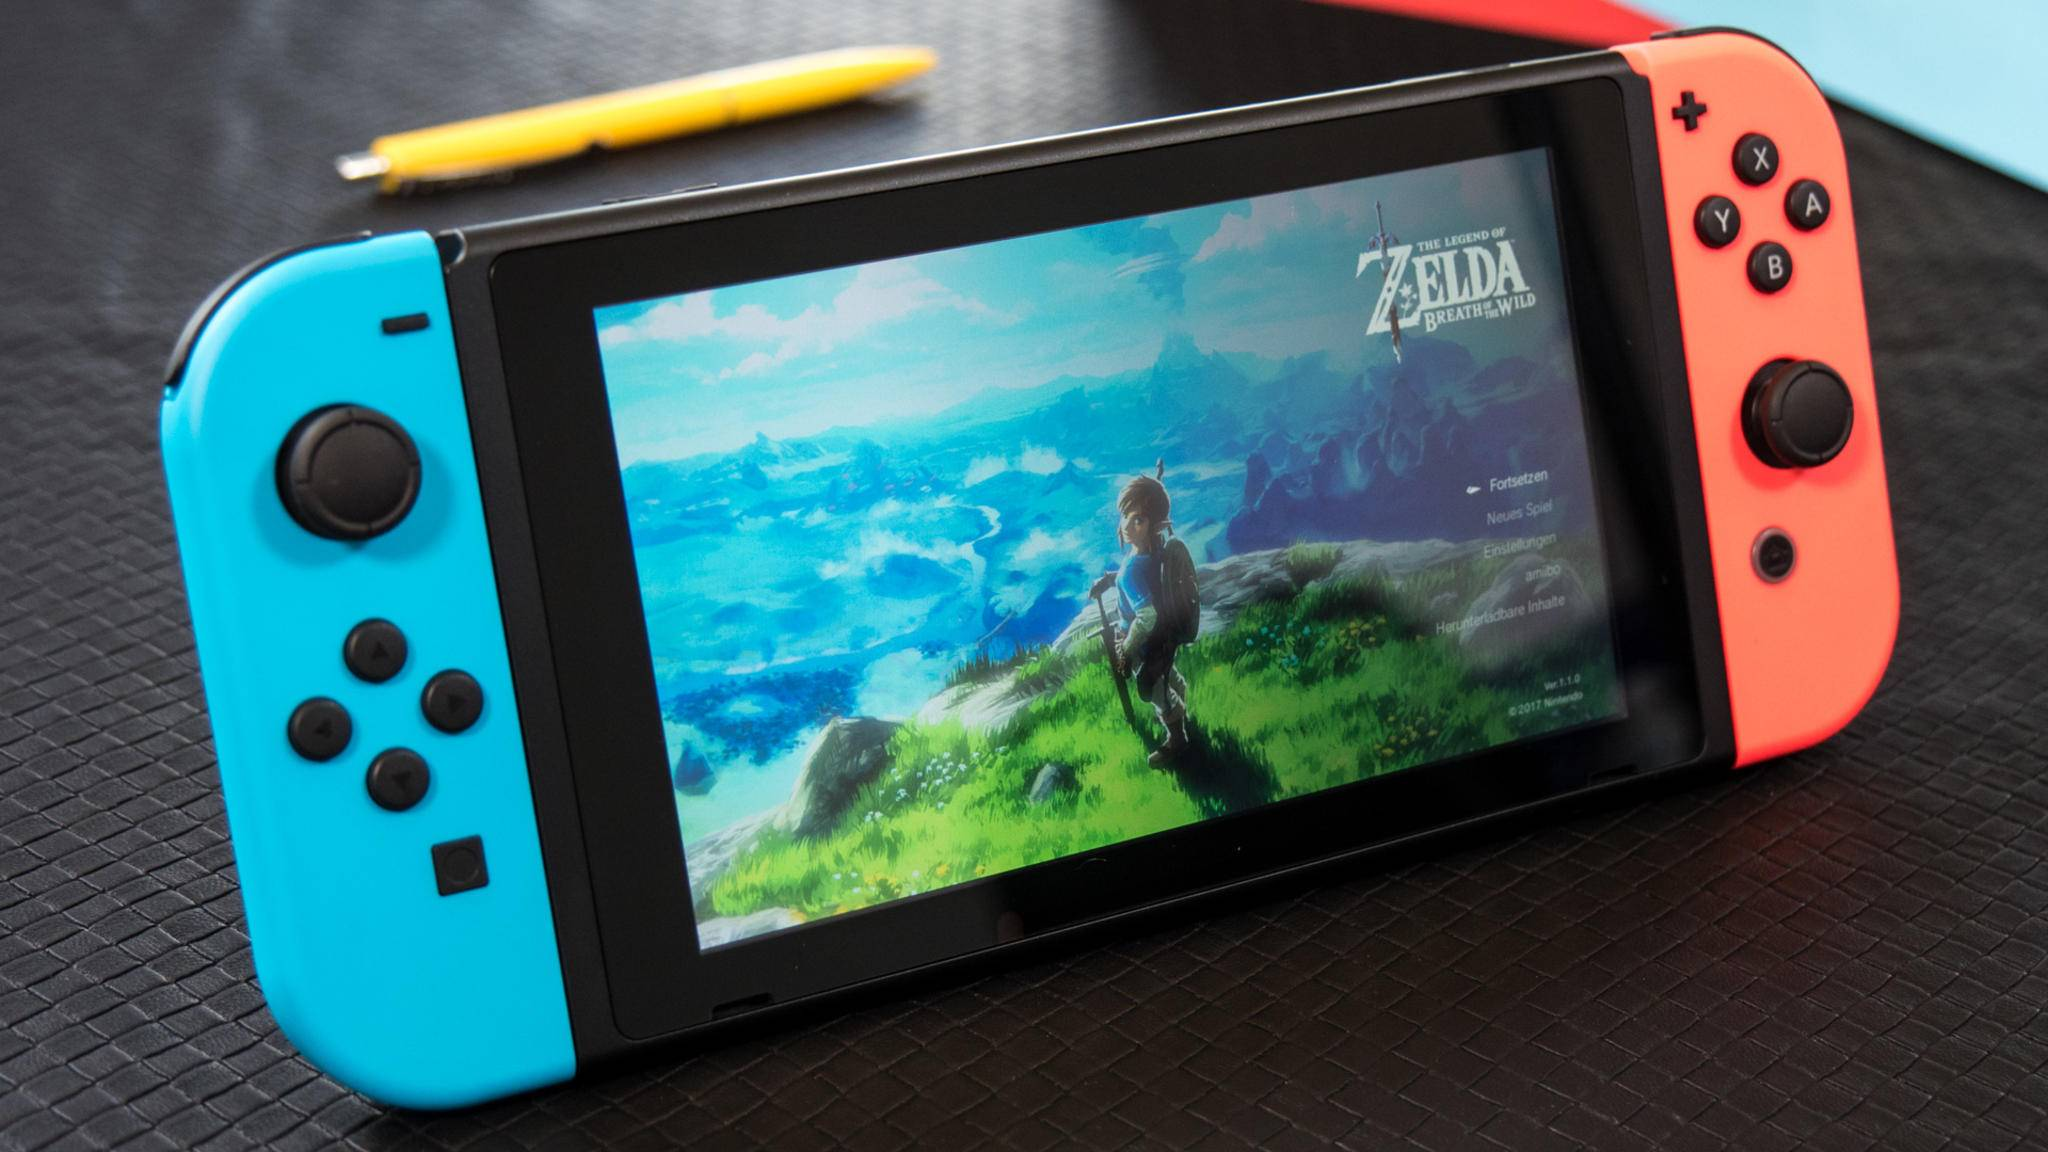 Geniales Konzept, grandios umgesetzt: die Nintendo Switch.